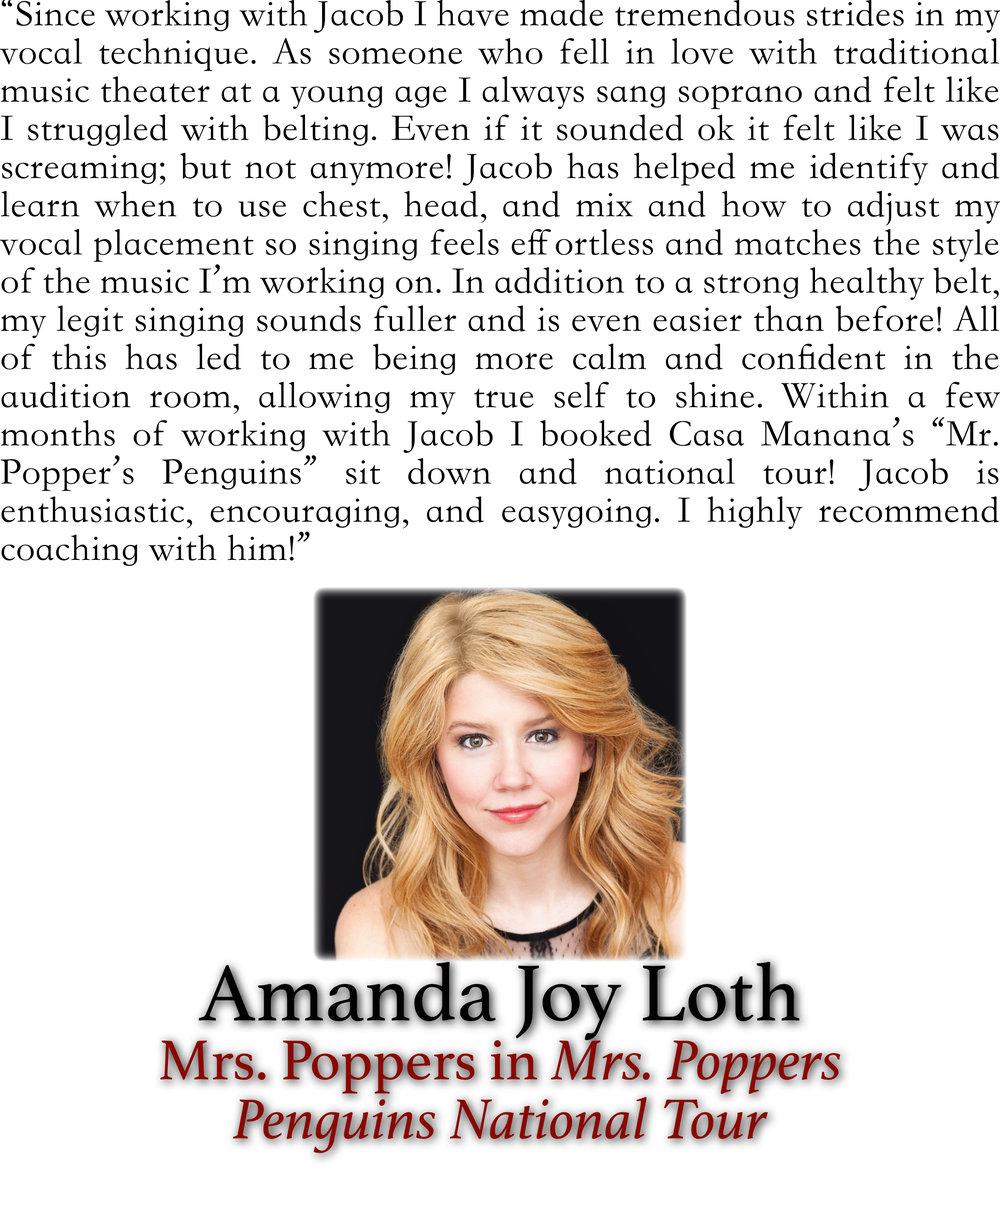 Amanda Joy Testimonial.jpg